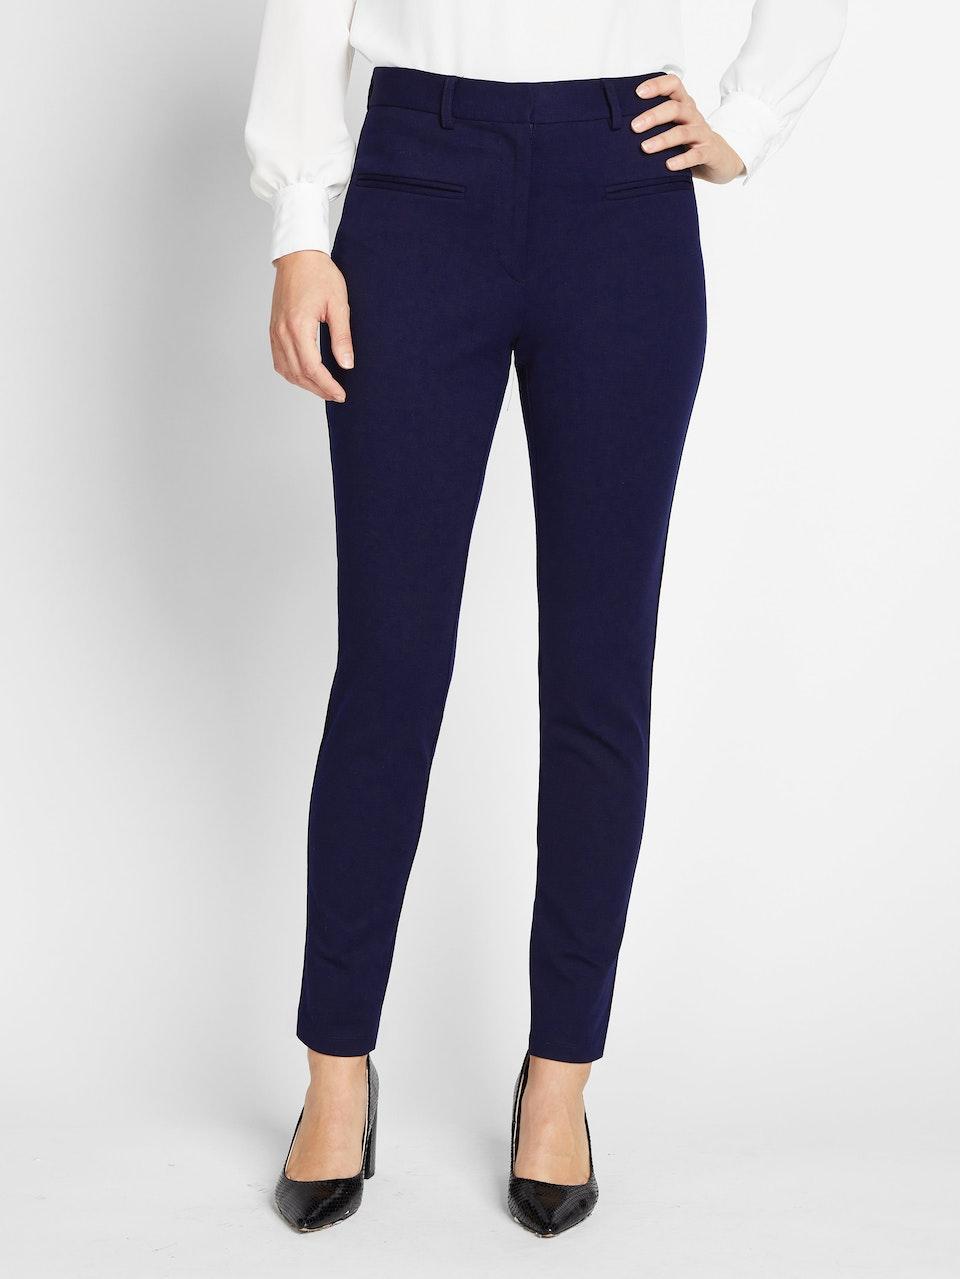 Essex Skinny Pants